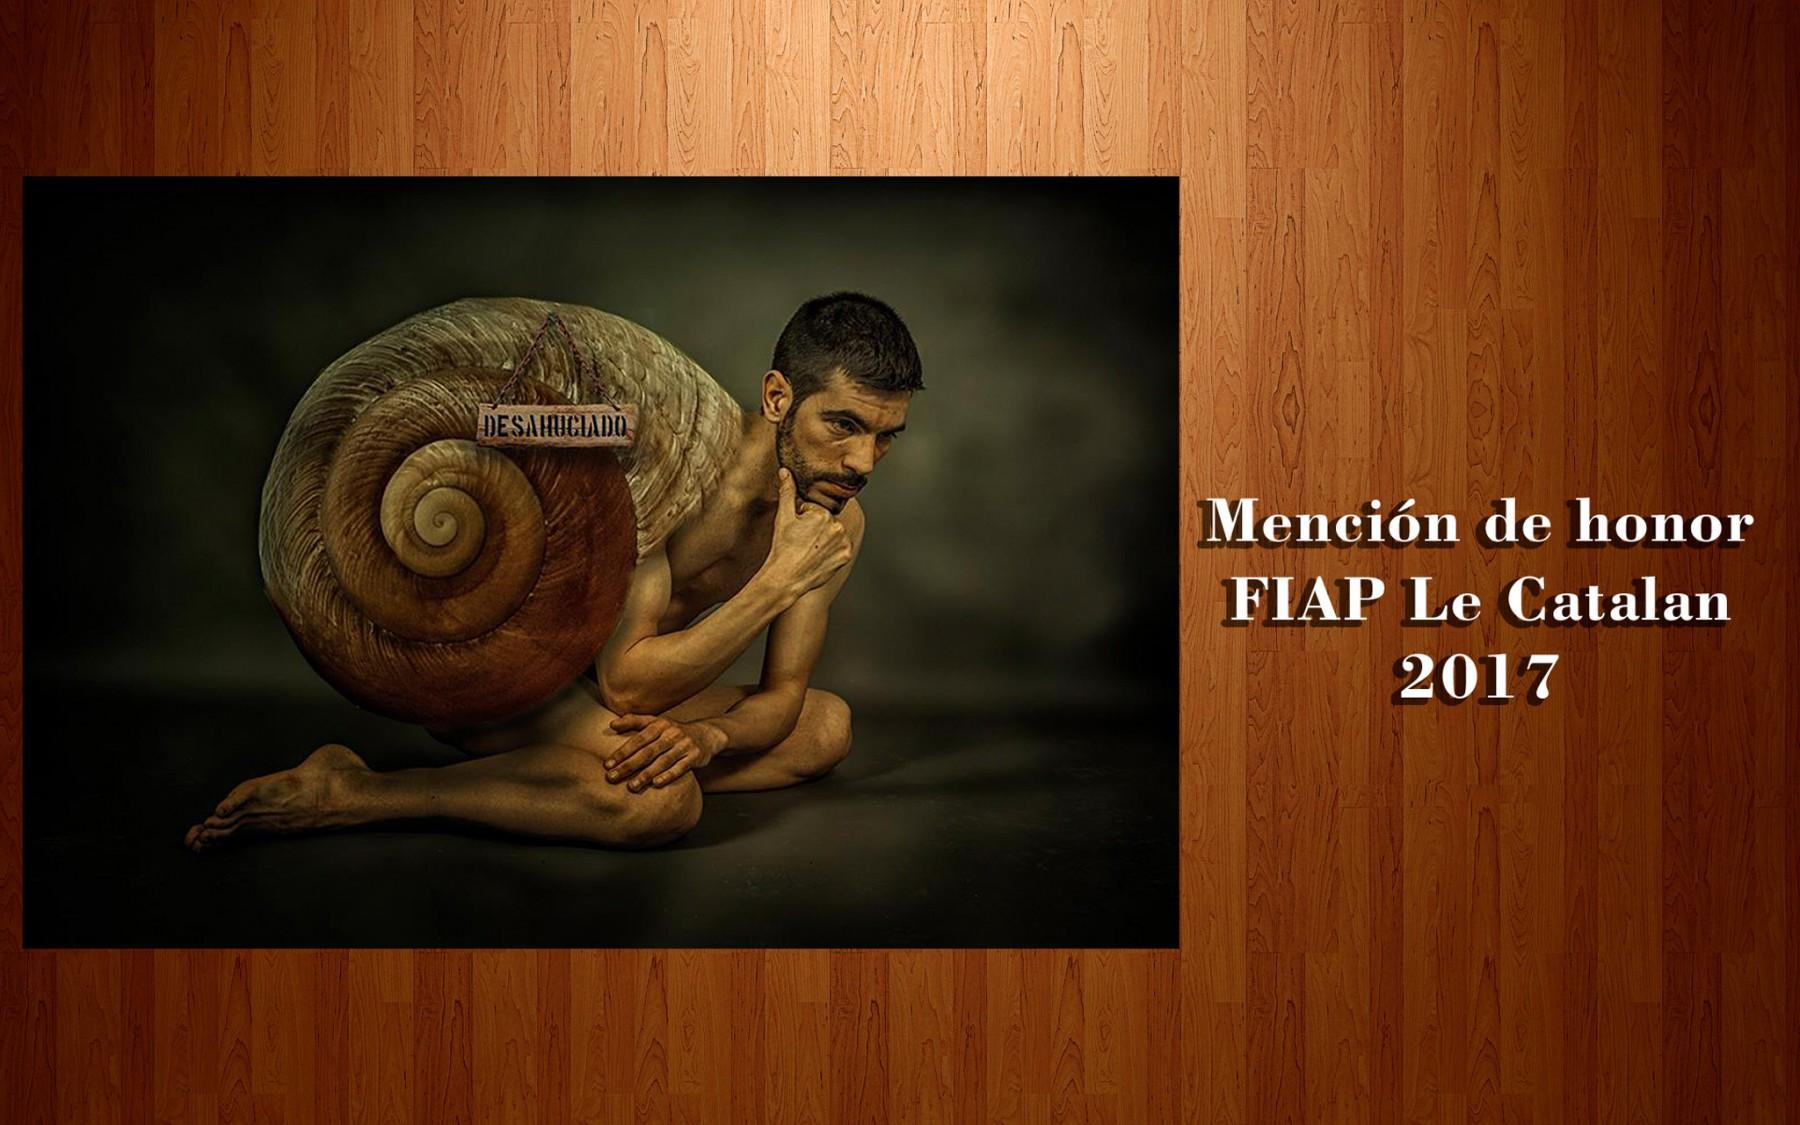 14-lightangel-fotografia-premios-fotograficospedro-jose-justicia